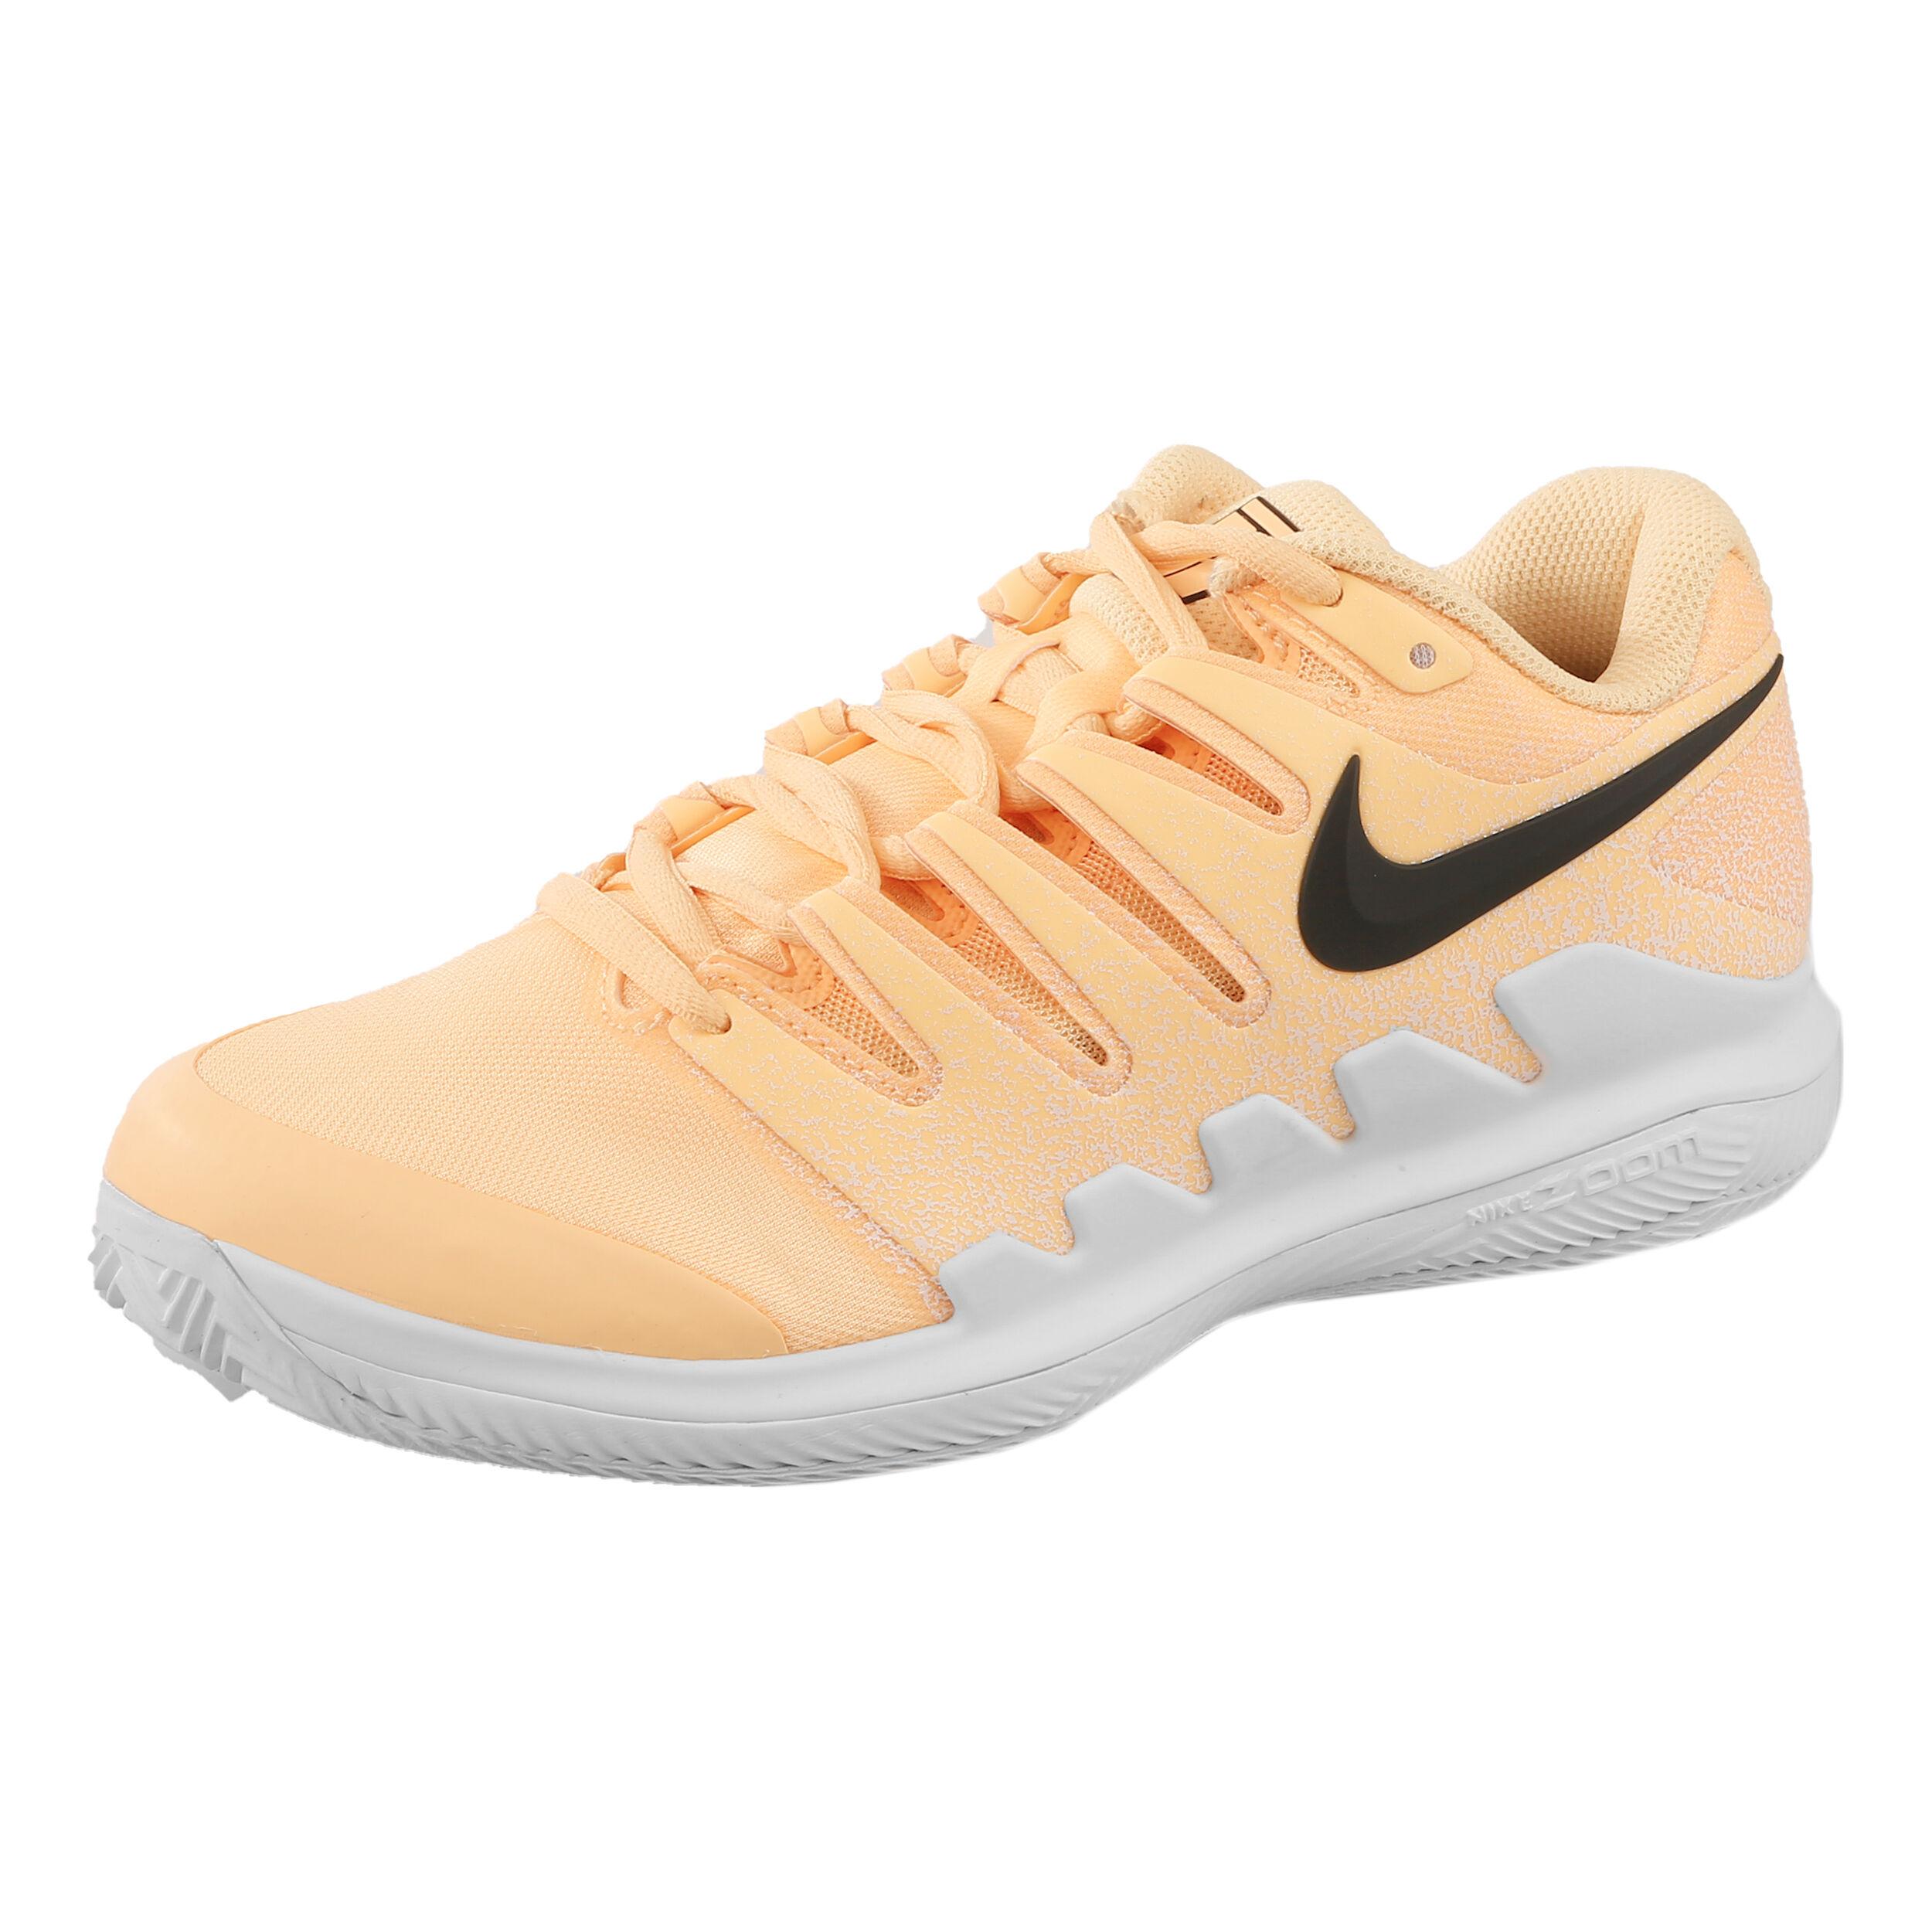 Nike Air Zoom Vapor X Clay Sandplatzschuh Damen Apricot, Weiß